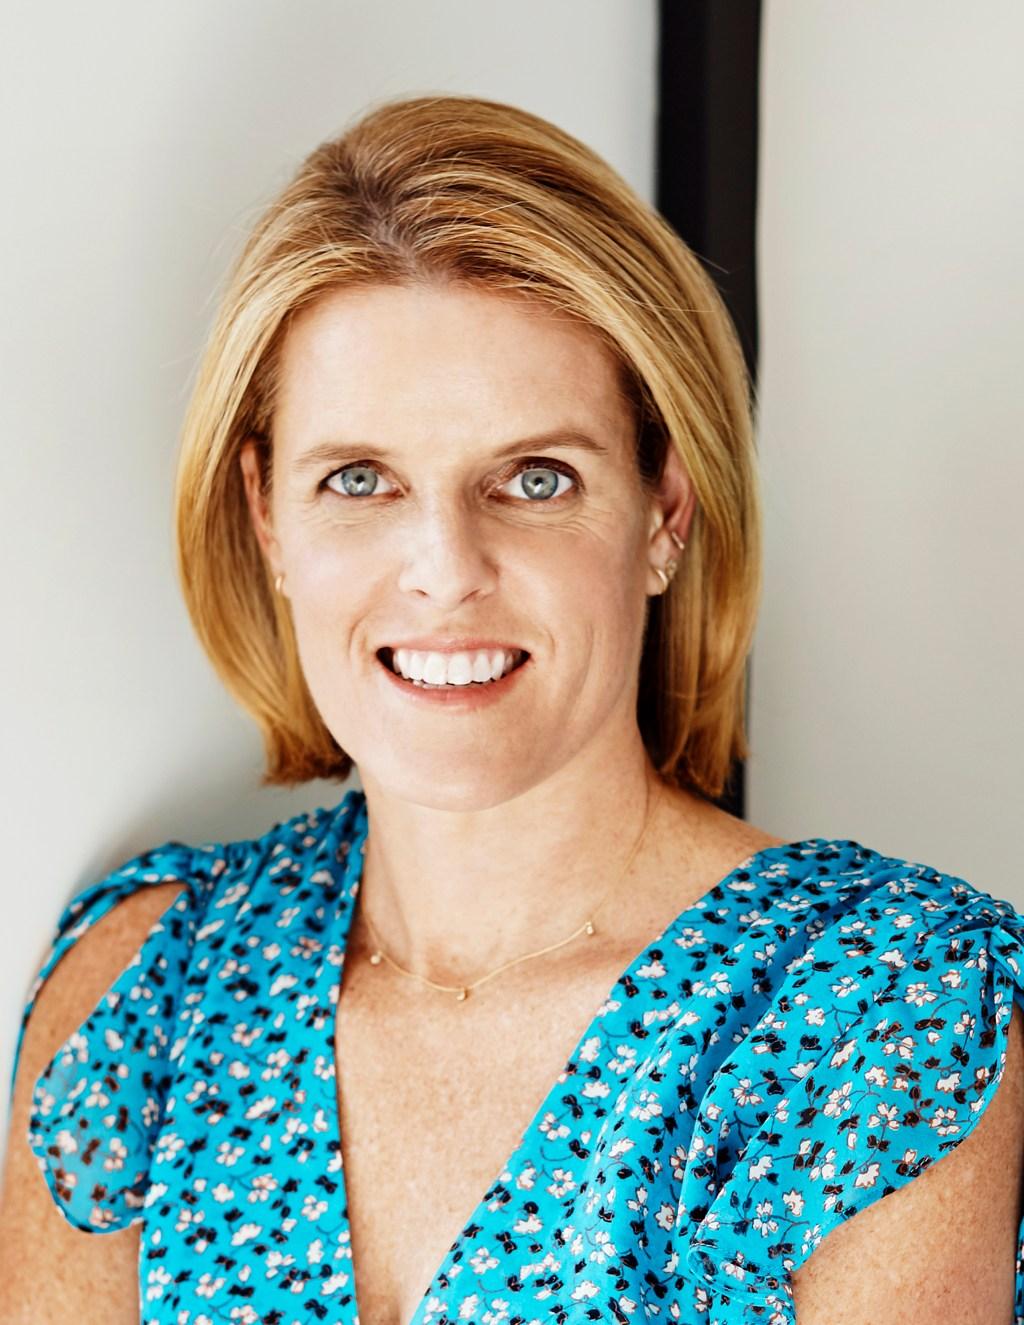 Episode 51 Lisa Gooder, Brides Magazine: The Passion of Storytelling